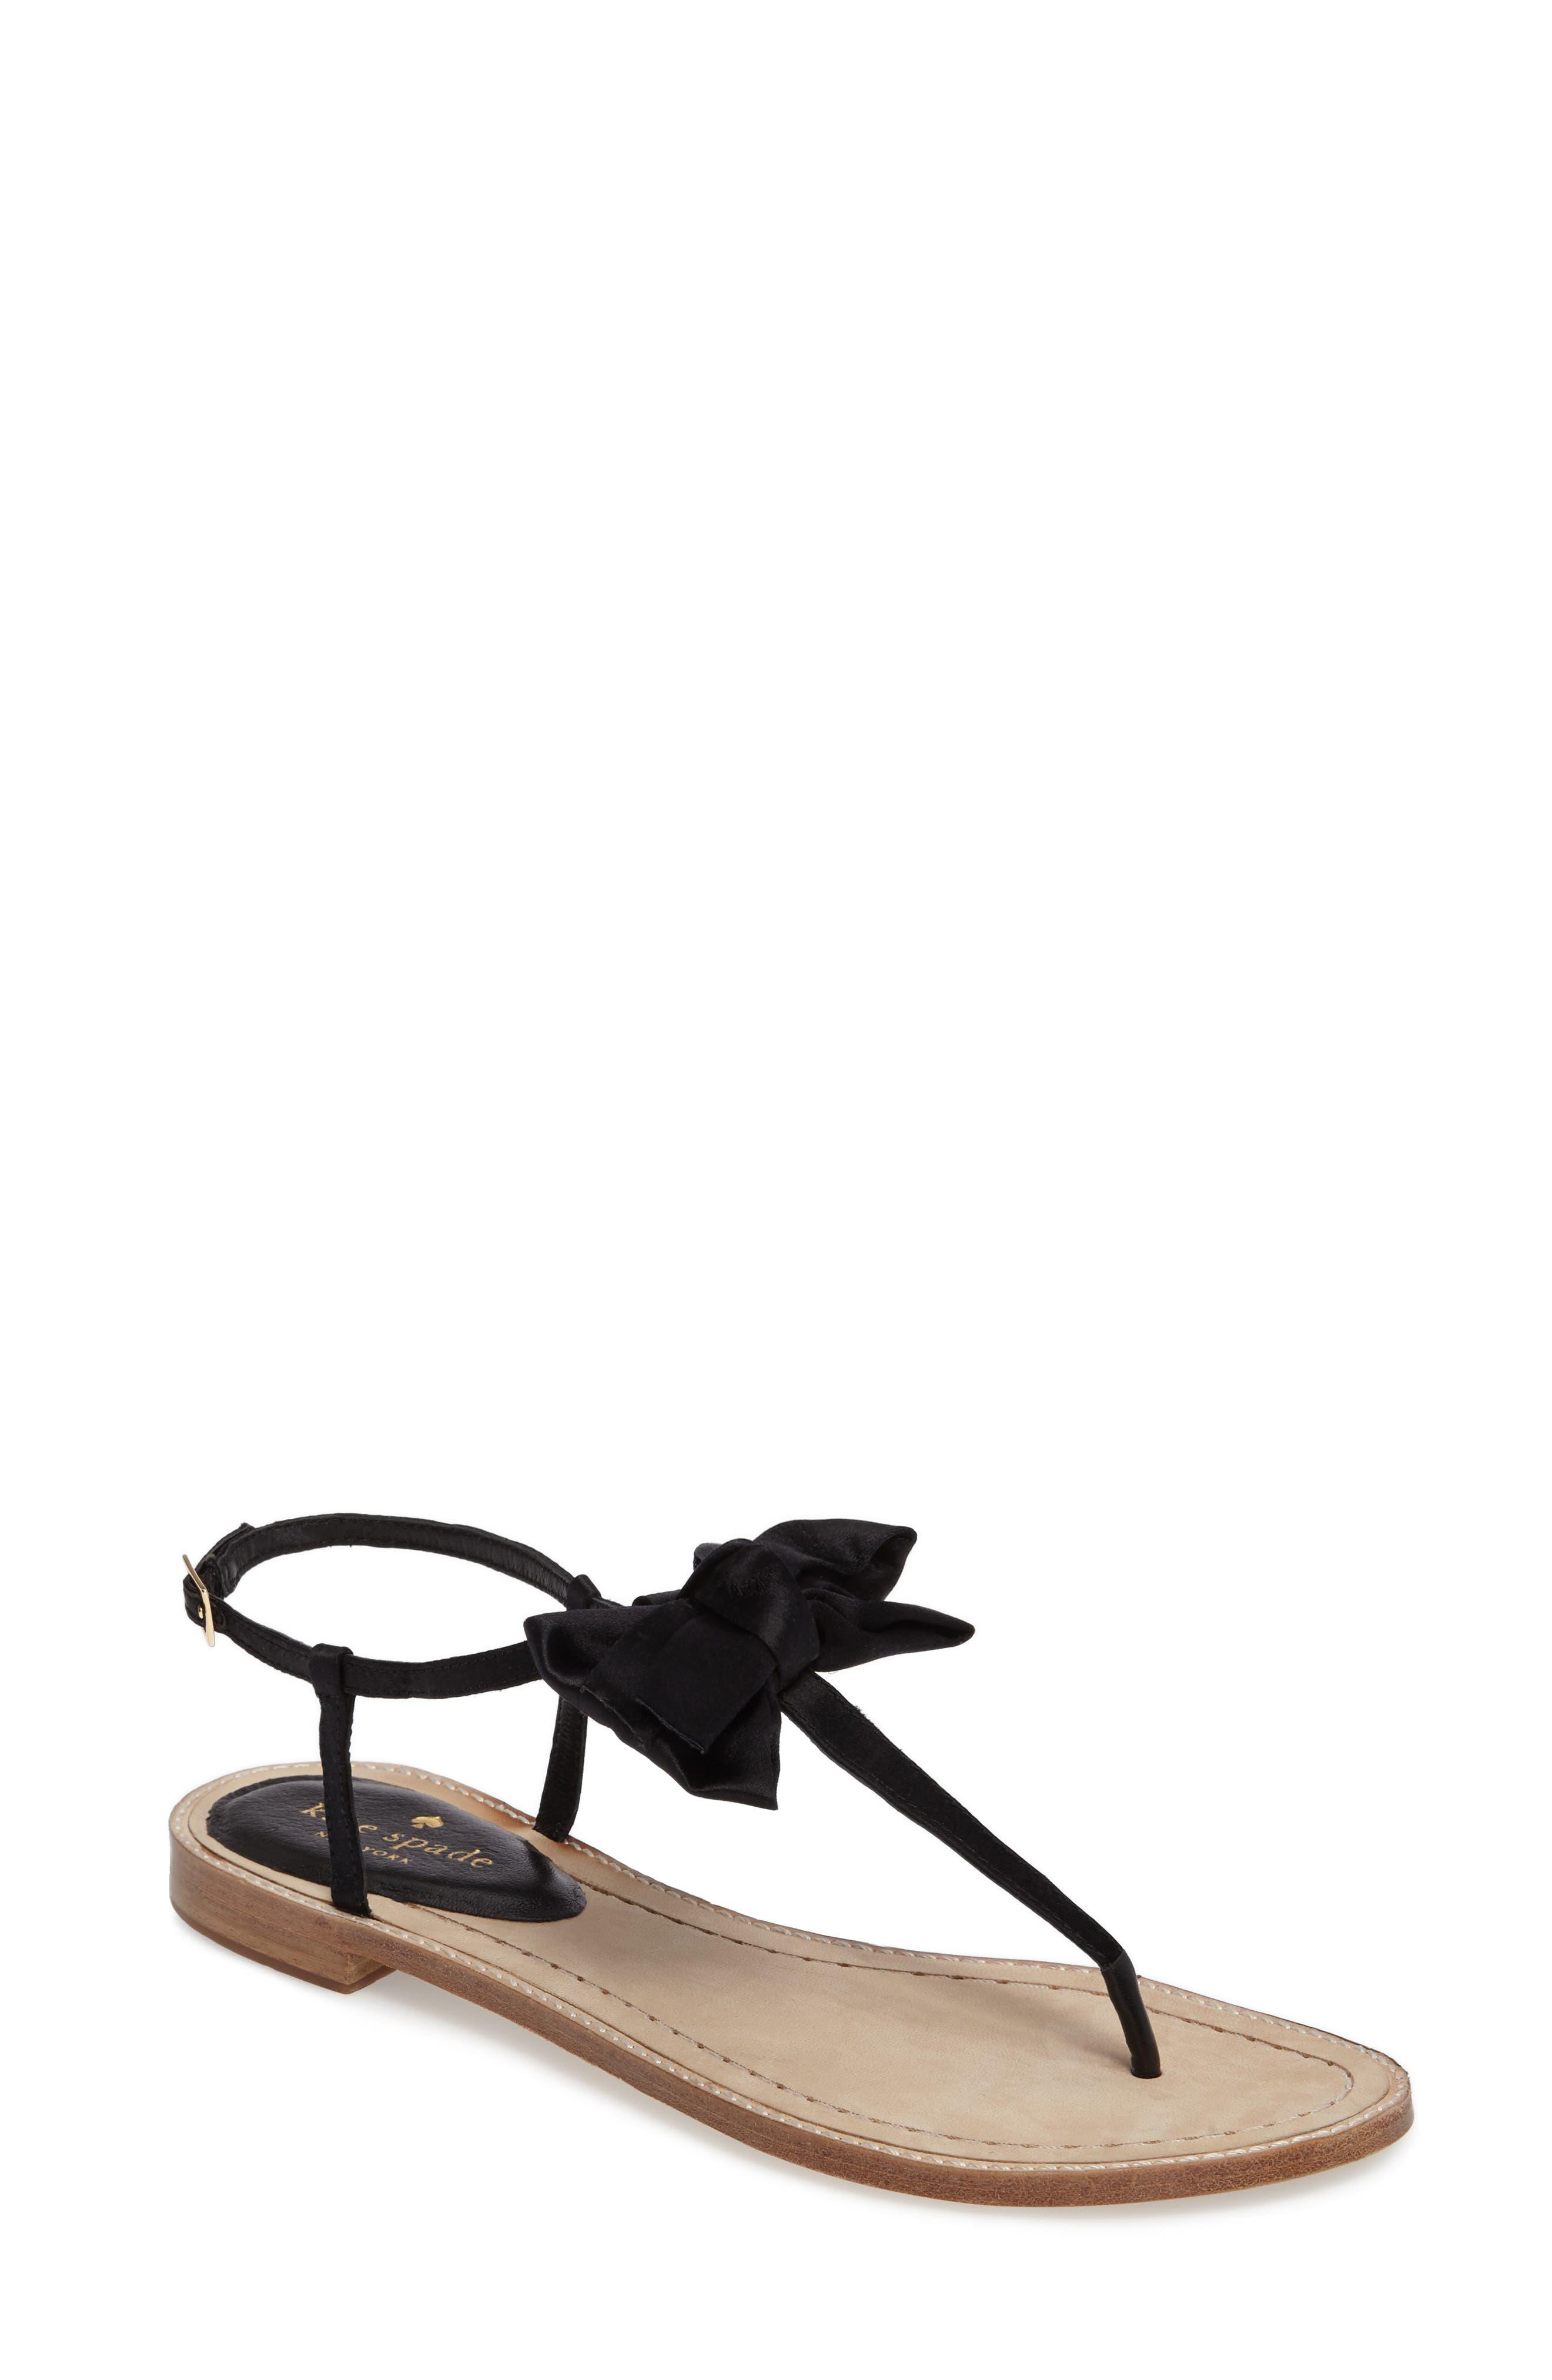 Alternate Image 1 Selected - kate spade new york serrano bow sandal (Women)